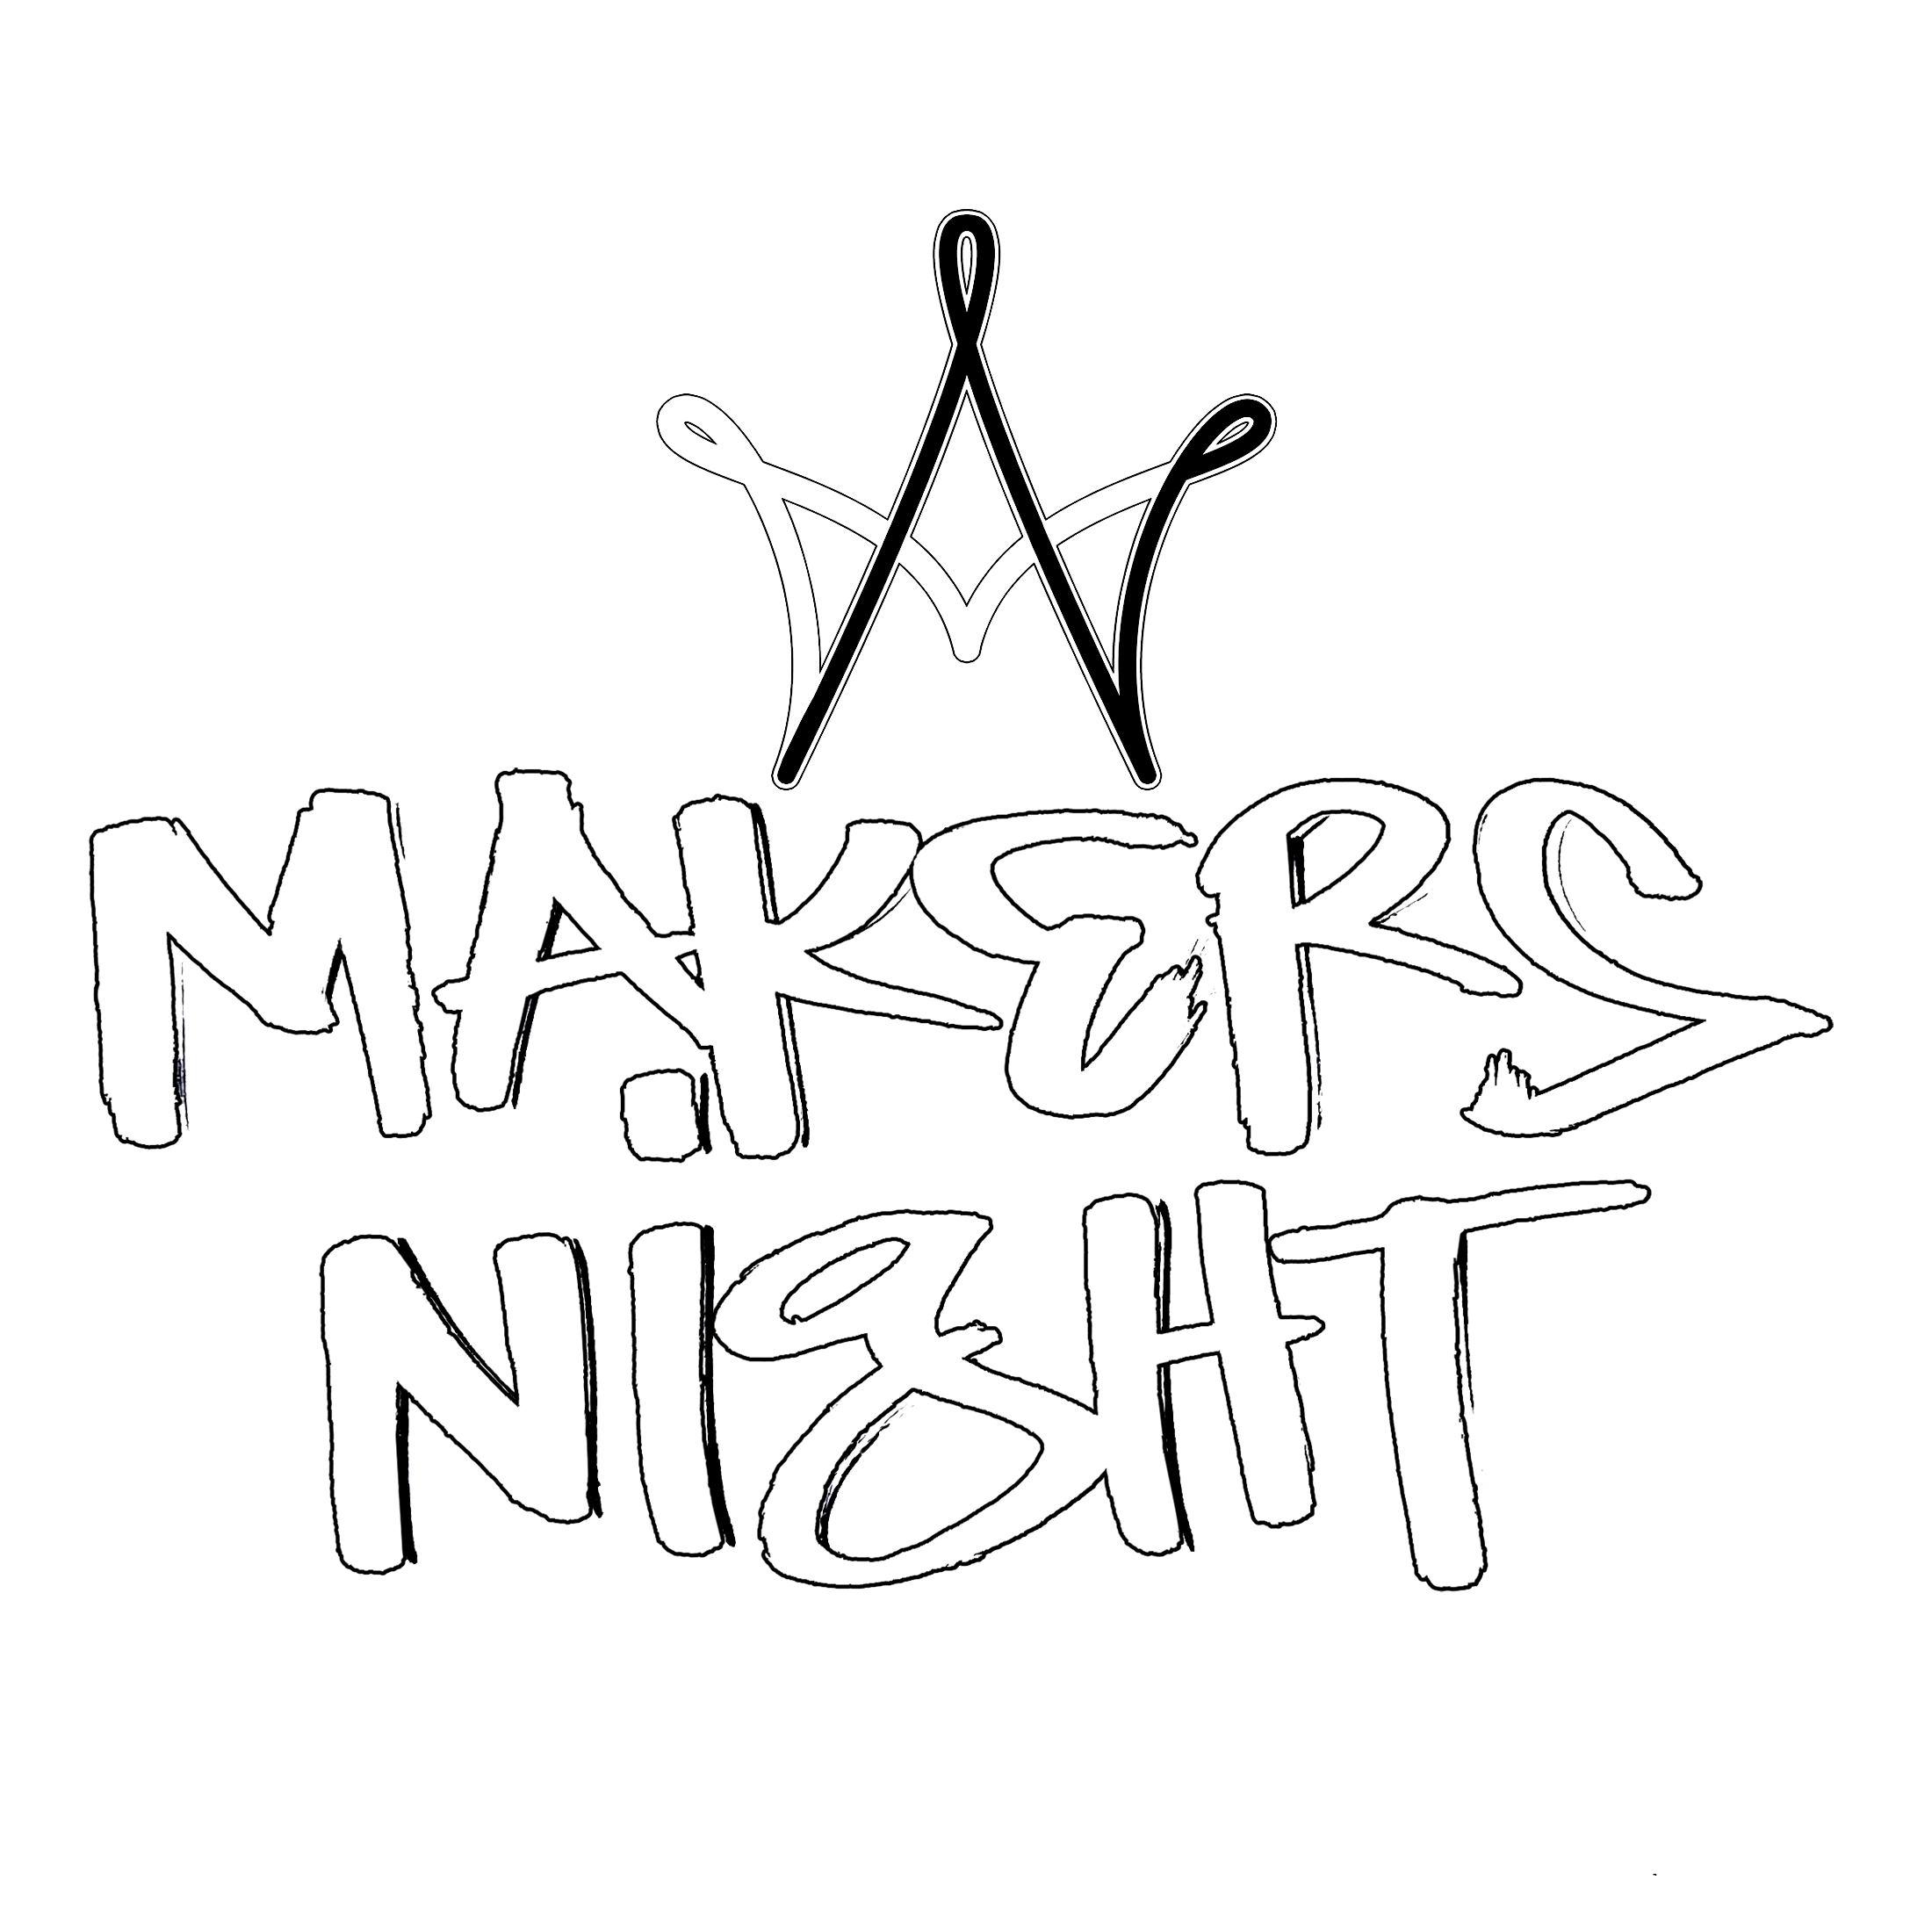 Makers Night Script